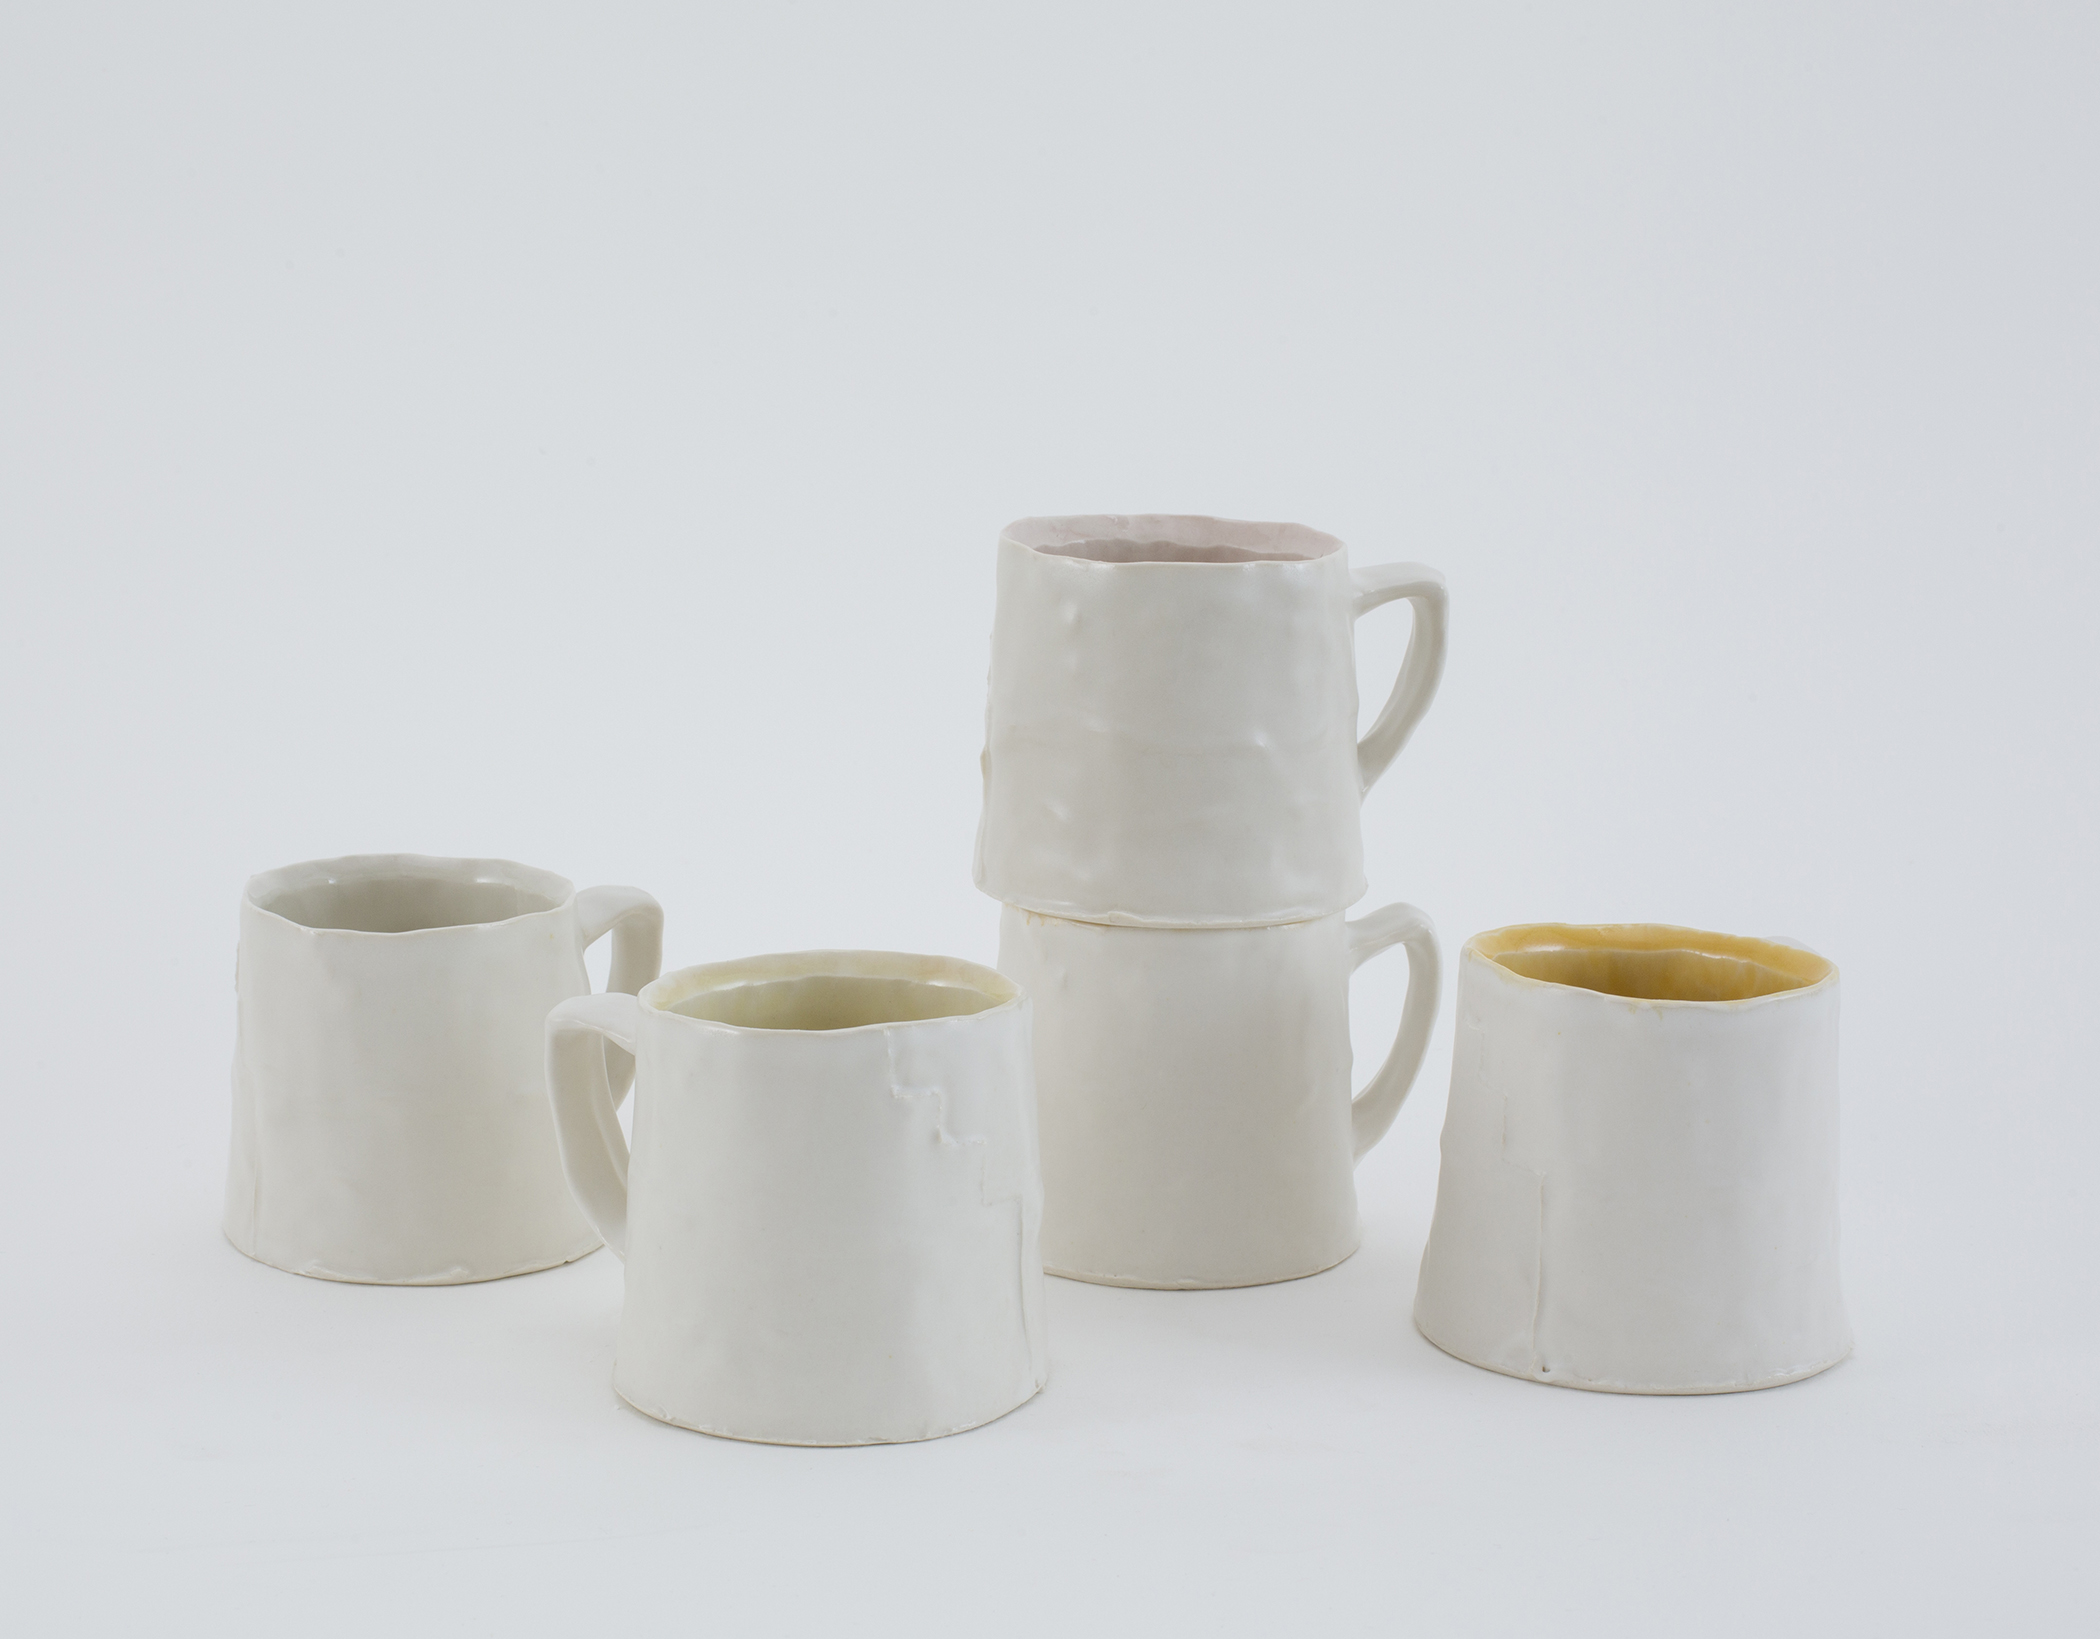 R.Massuch.mugs.5x7.jpg